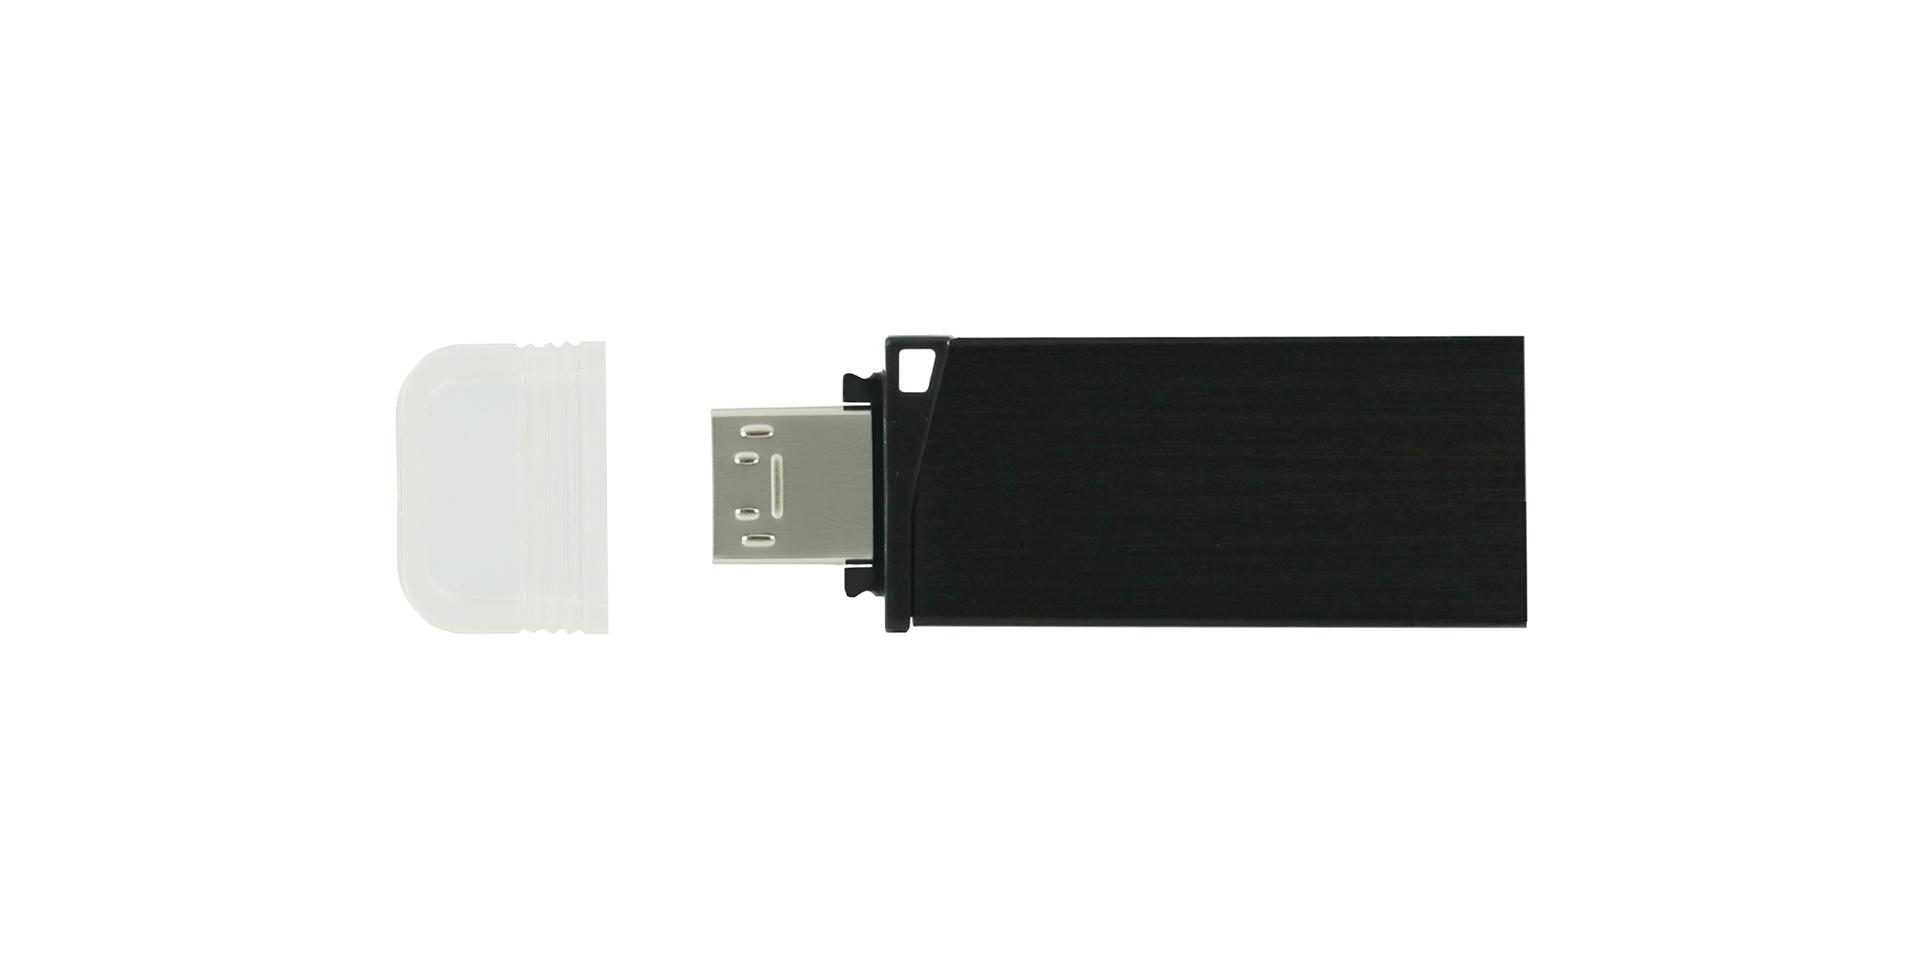 Elegant USB for advertising agencies